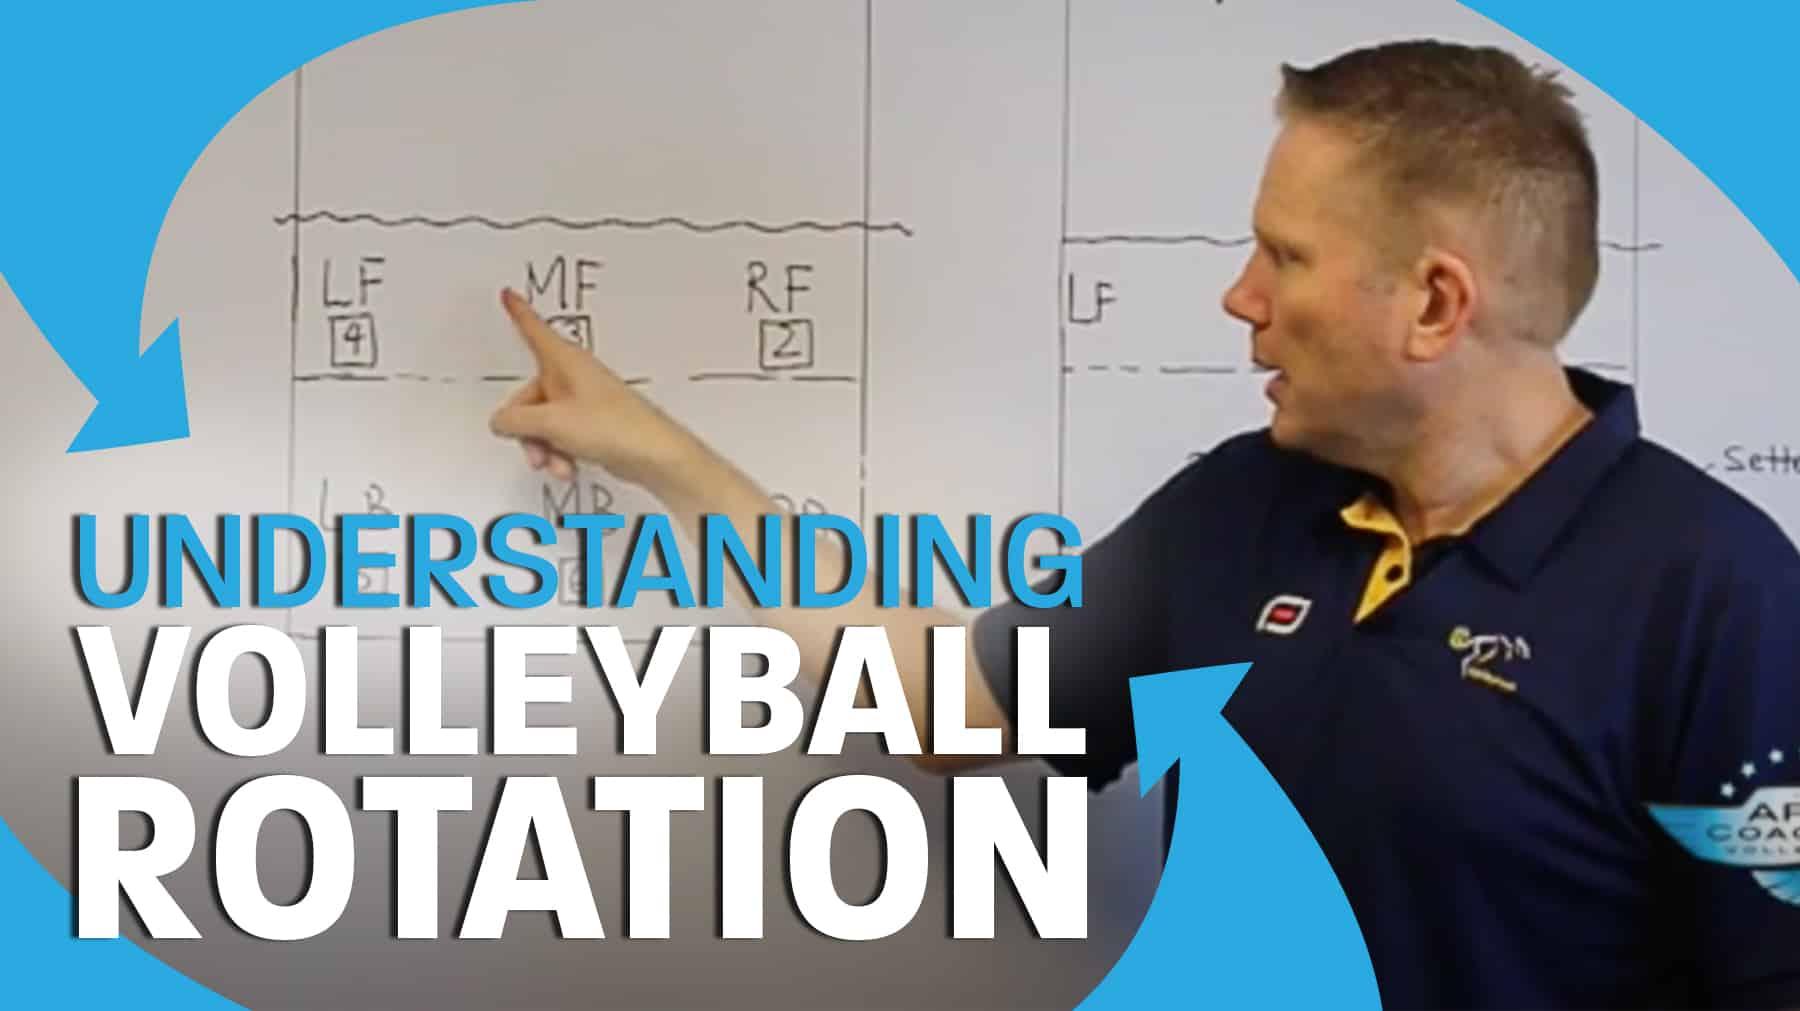 Volleyball Rotation The Basics